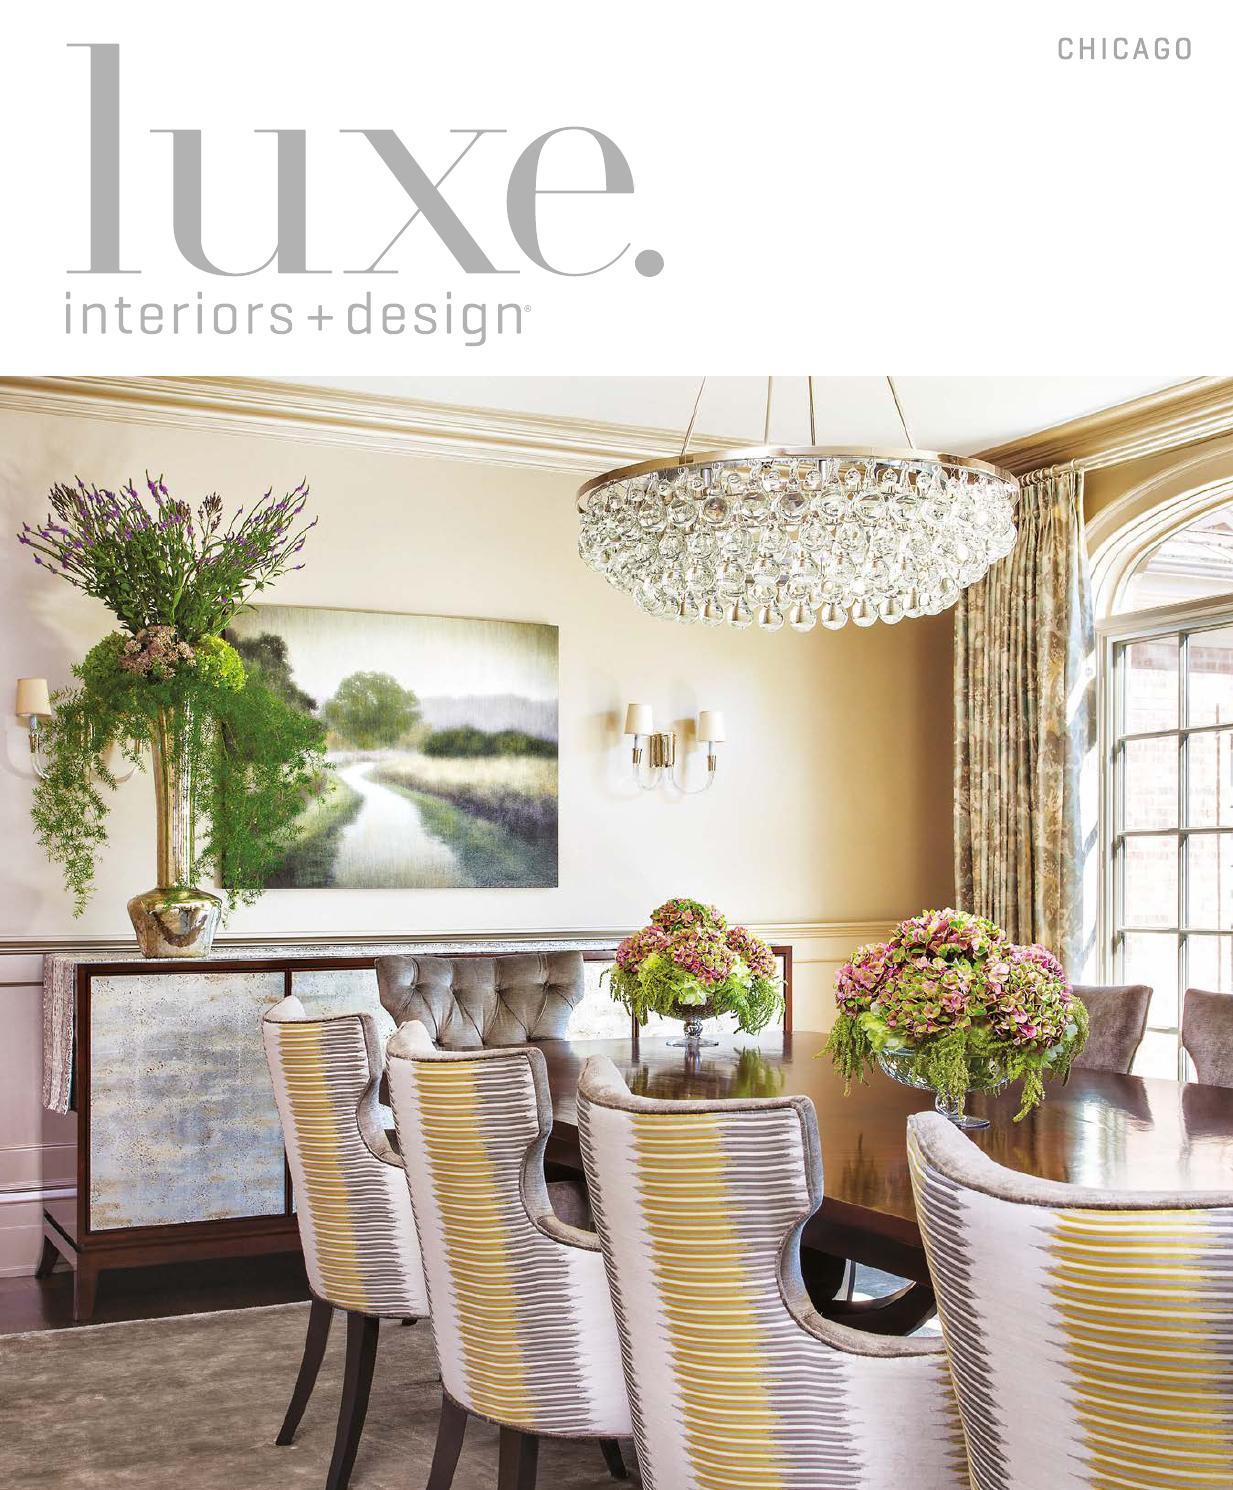 Luxe Magazine November 2015 Chicago by SANDOW® - issuu